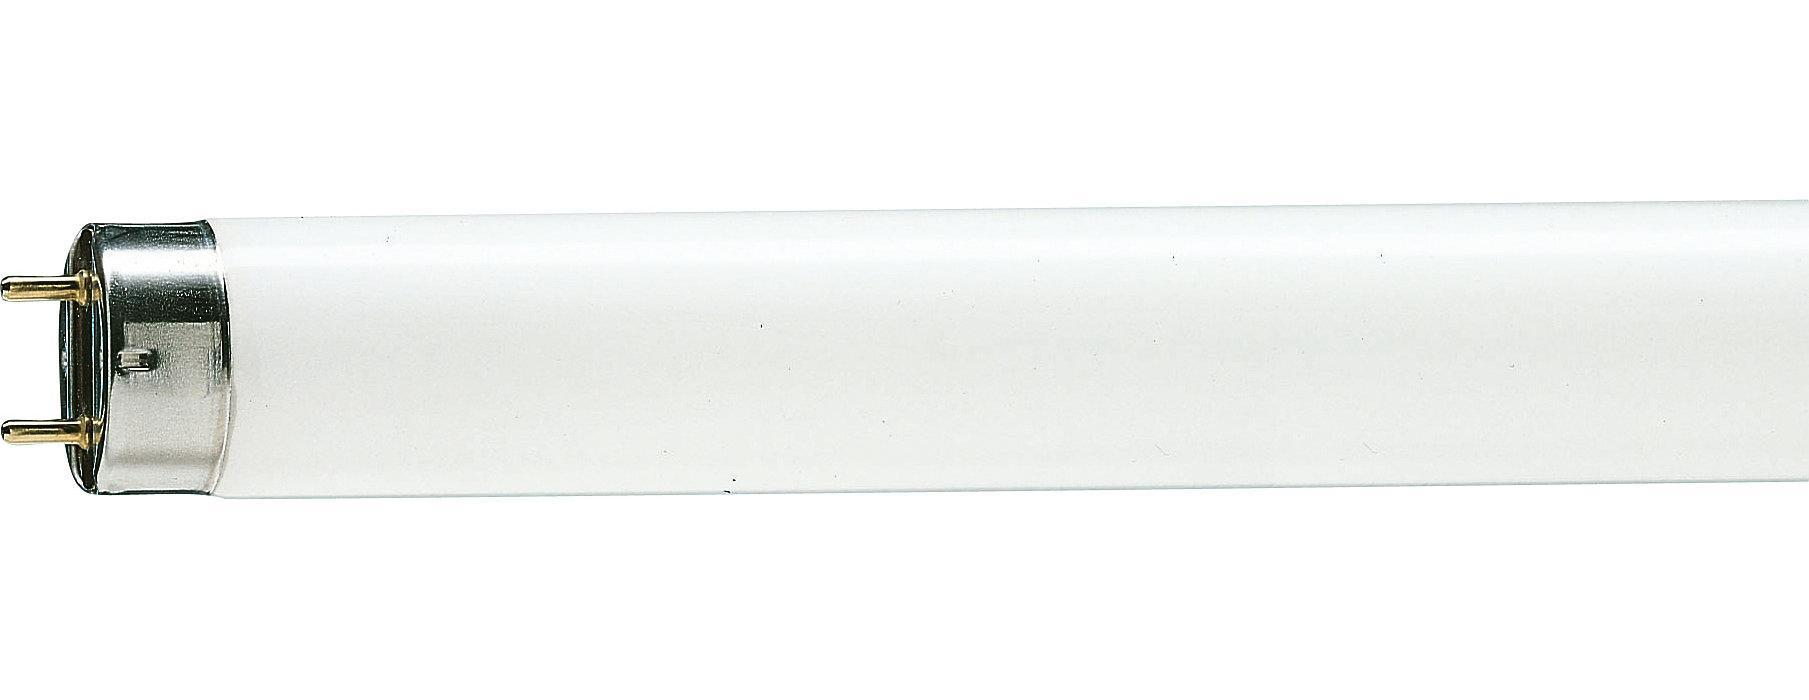 [Bundle of 10] PHILIPS LifeMax  Fluorescent Lamp 36W Cool Daylight [TL-D 36W/54-765]